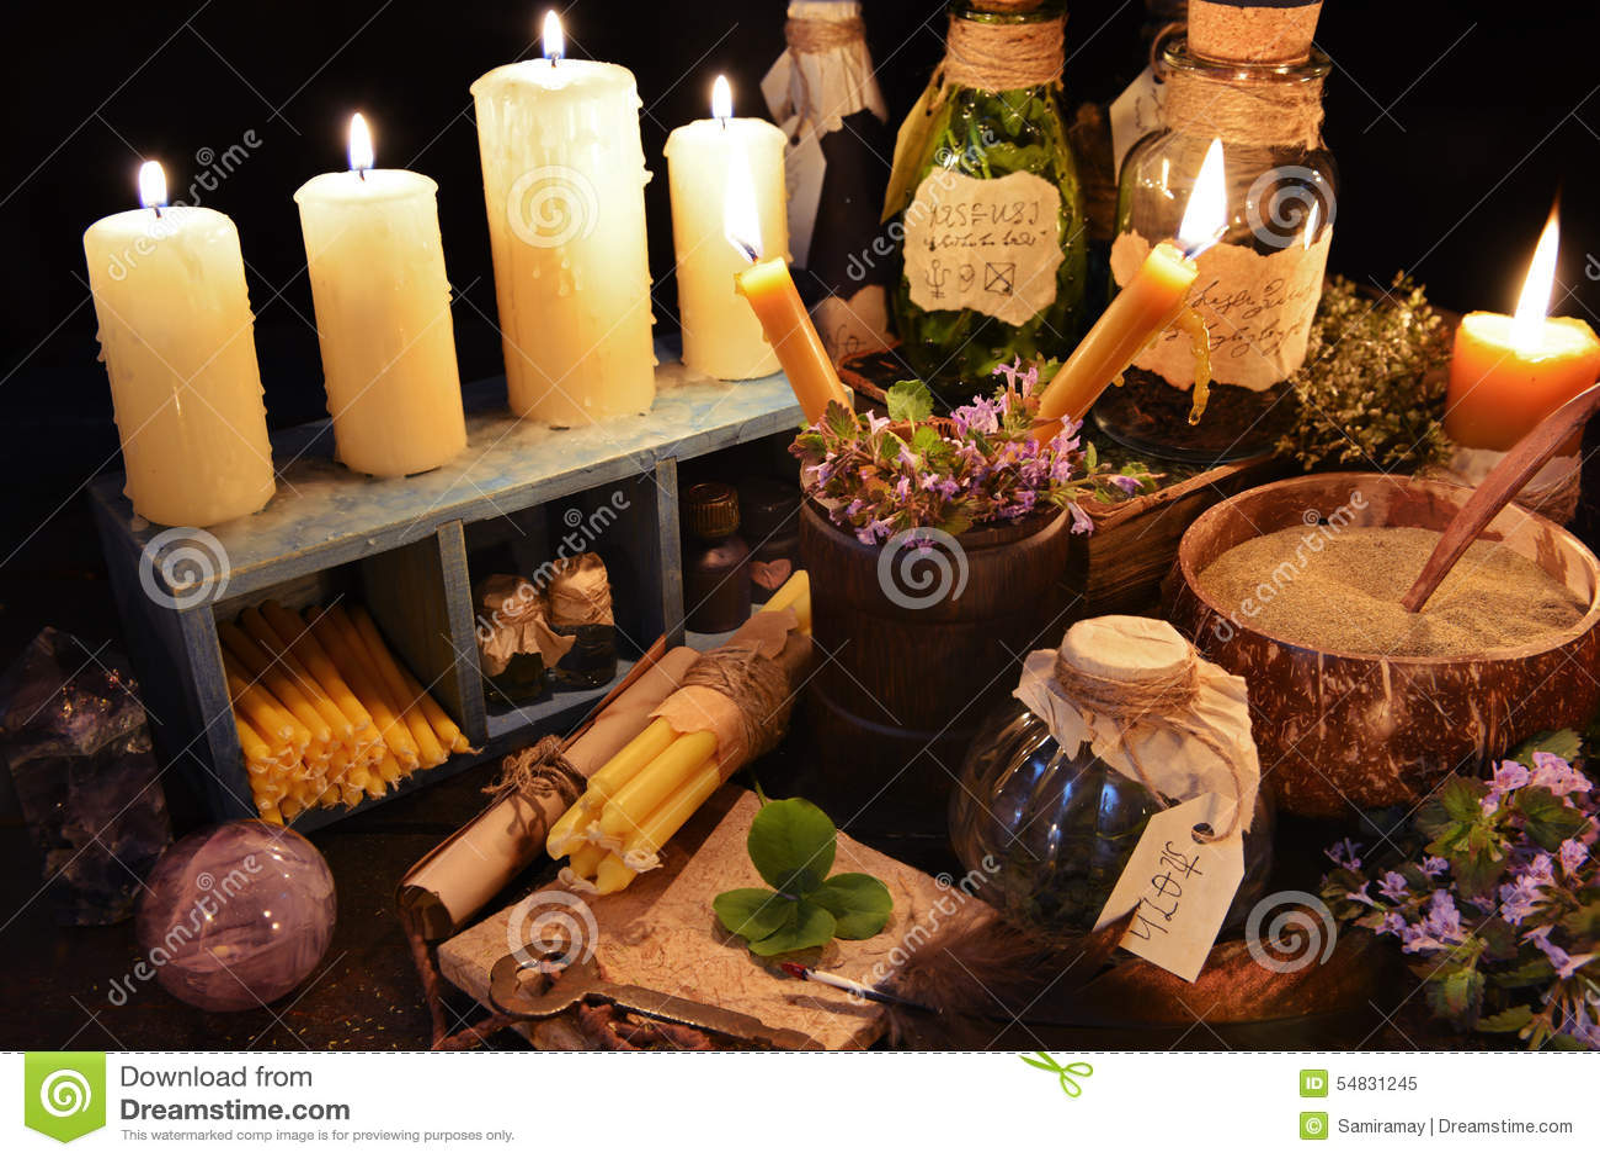 Alternative medicine theme ot witch table stock photo for Halloween medicine bottles